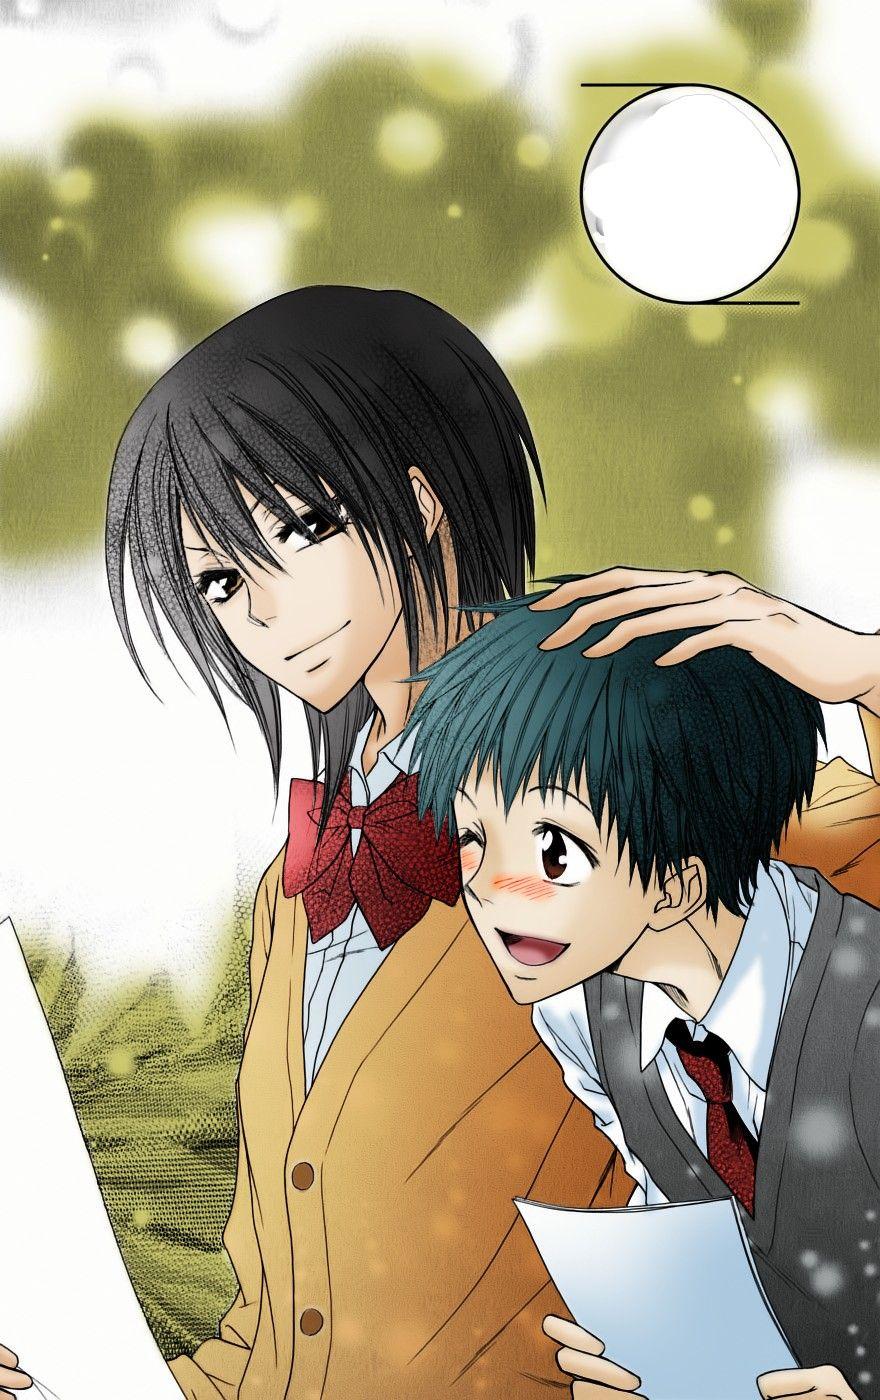 Misaki and Yukimura Maid sama, Kaichō wa maidsama!, Sama